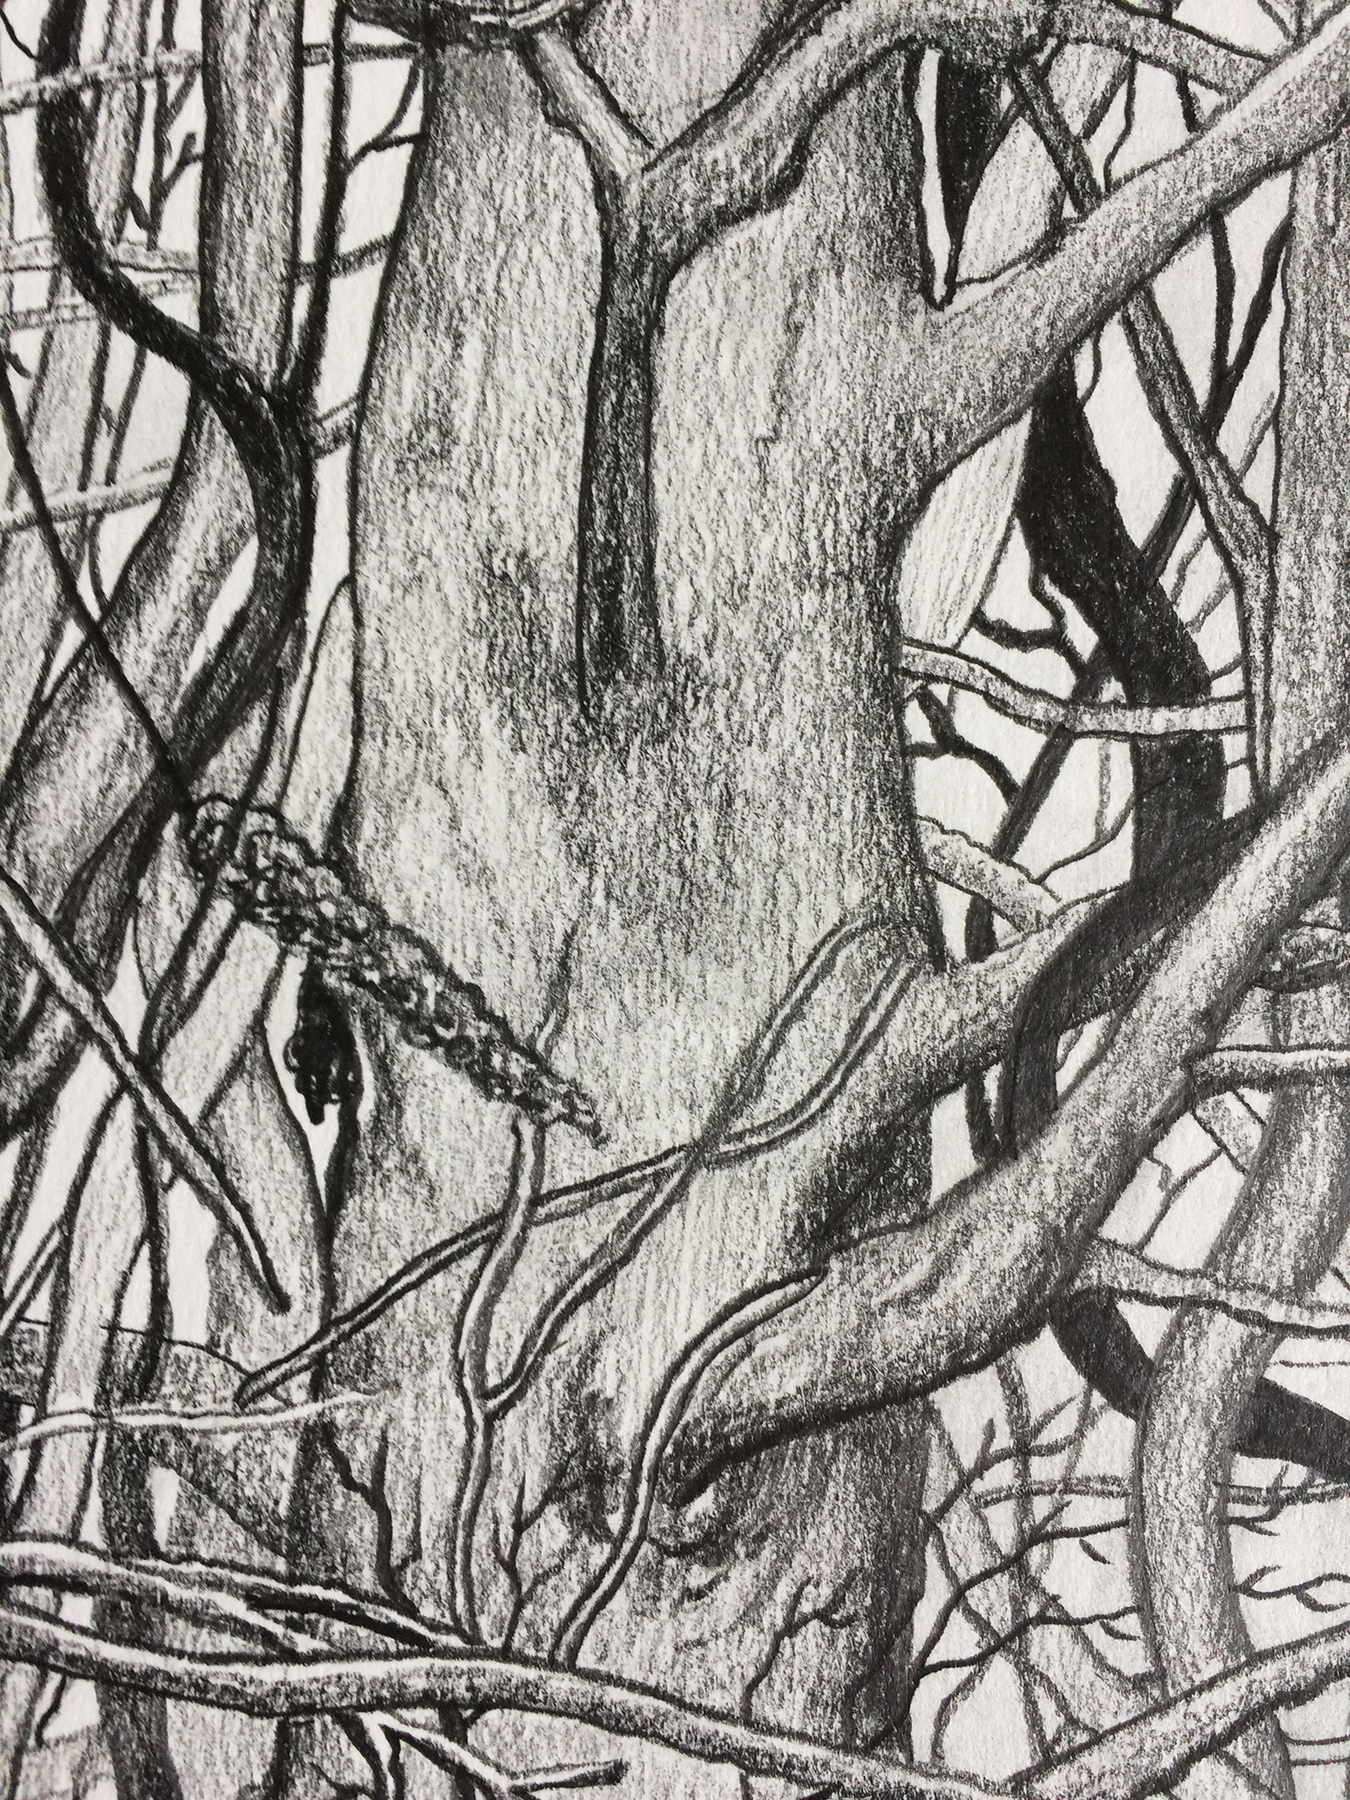 Human Nature 1   A2 Giclée Print - detail